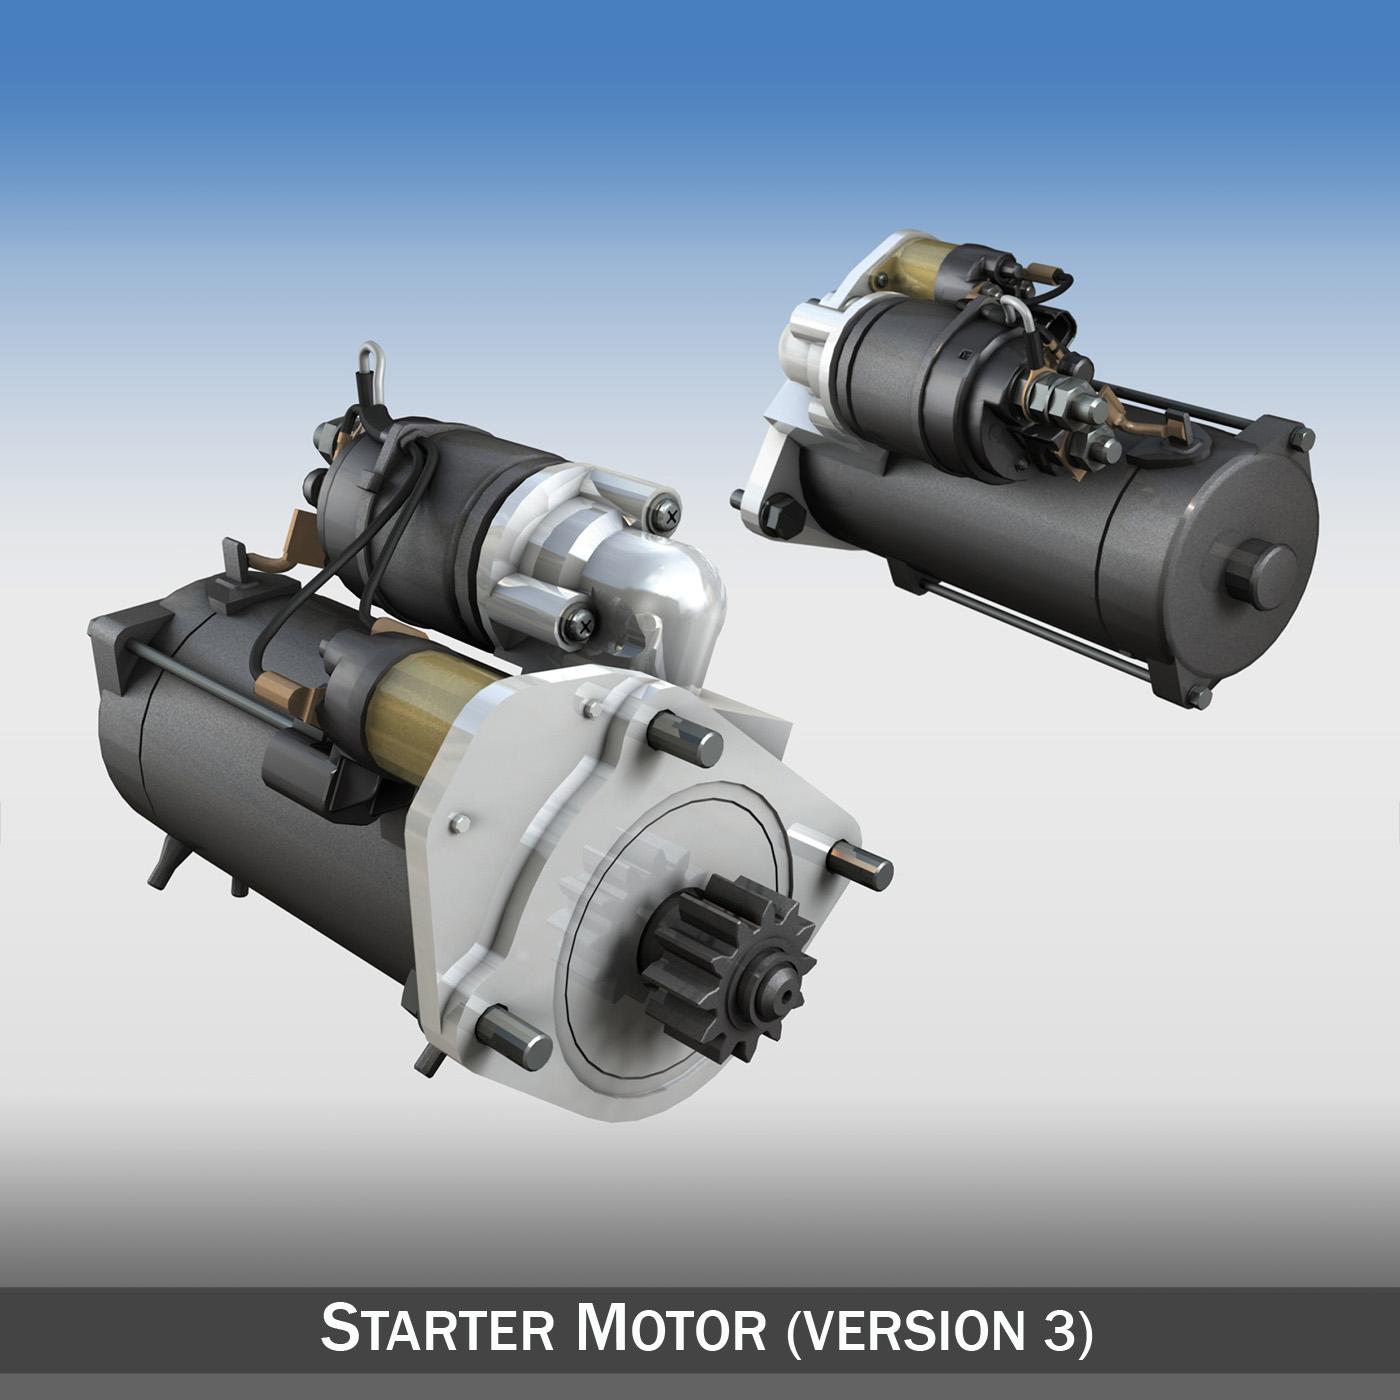 startera motors 03 3d modelis 3ds fbx c4d lwo obj 201936